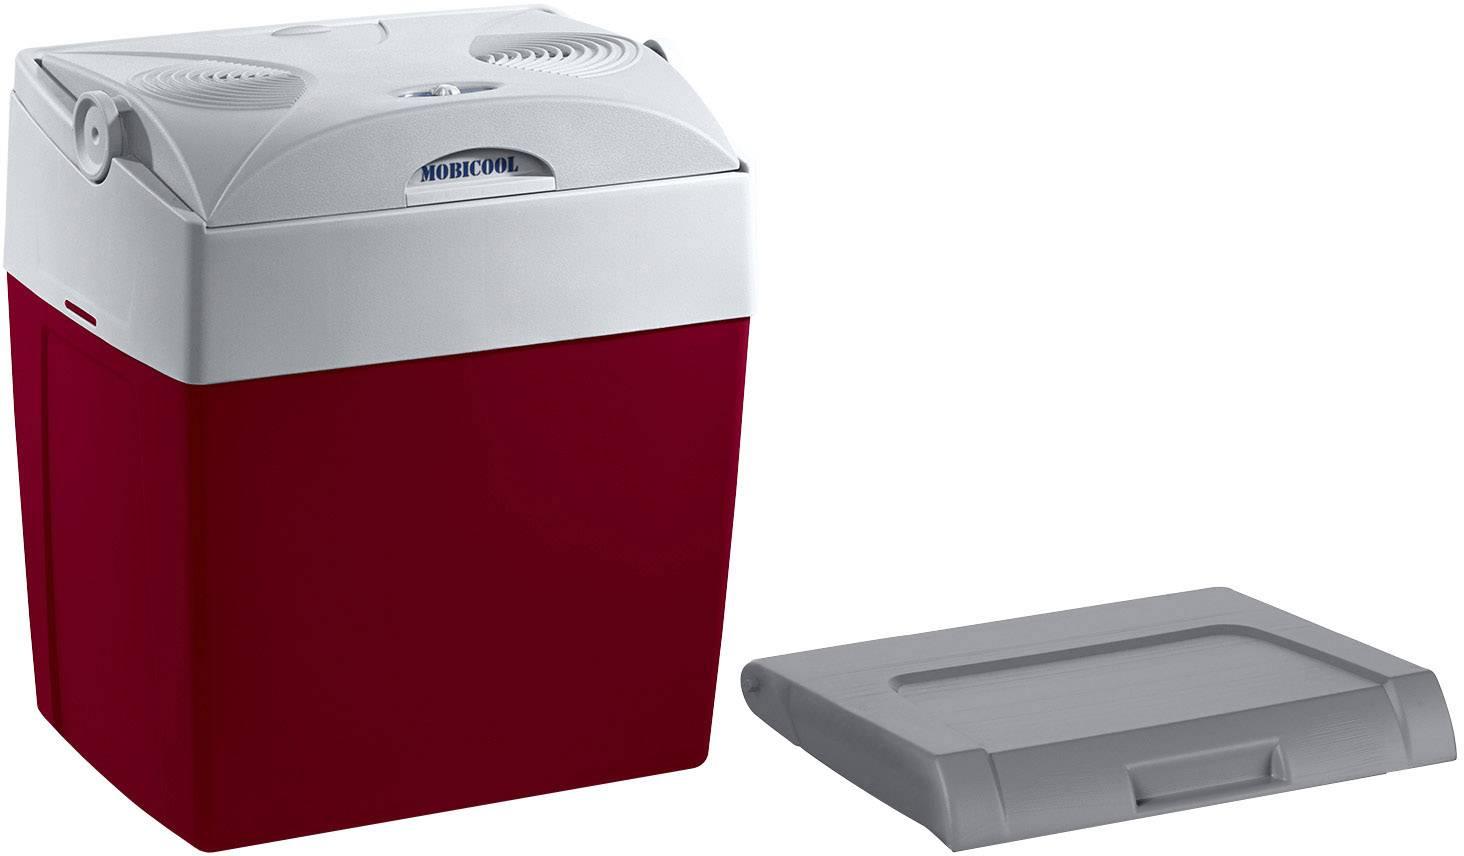 Mini Kühlschrank Conrad : Mobicool f minikühlschrank partykühler thermoelektrisch v